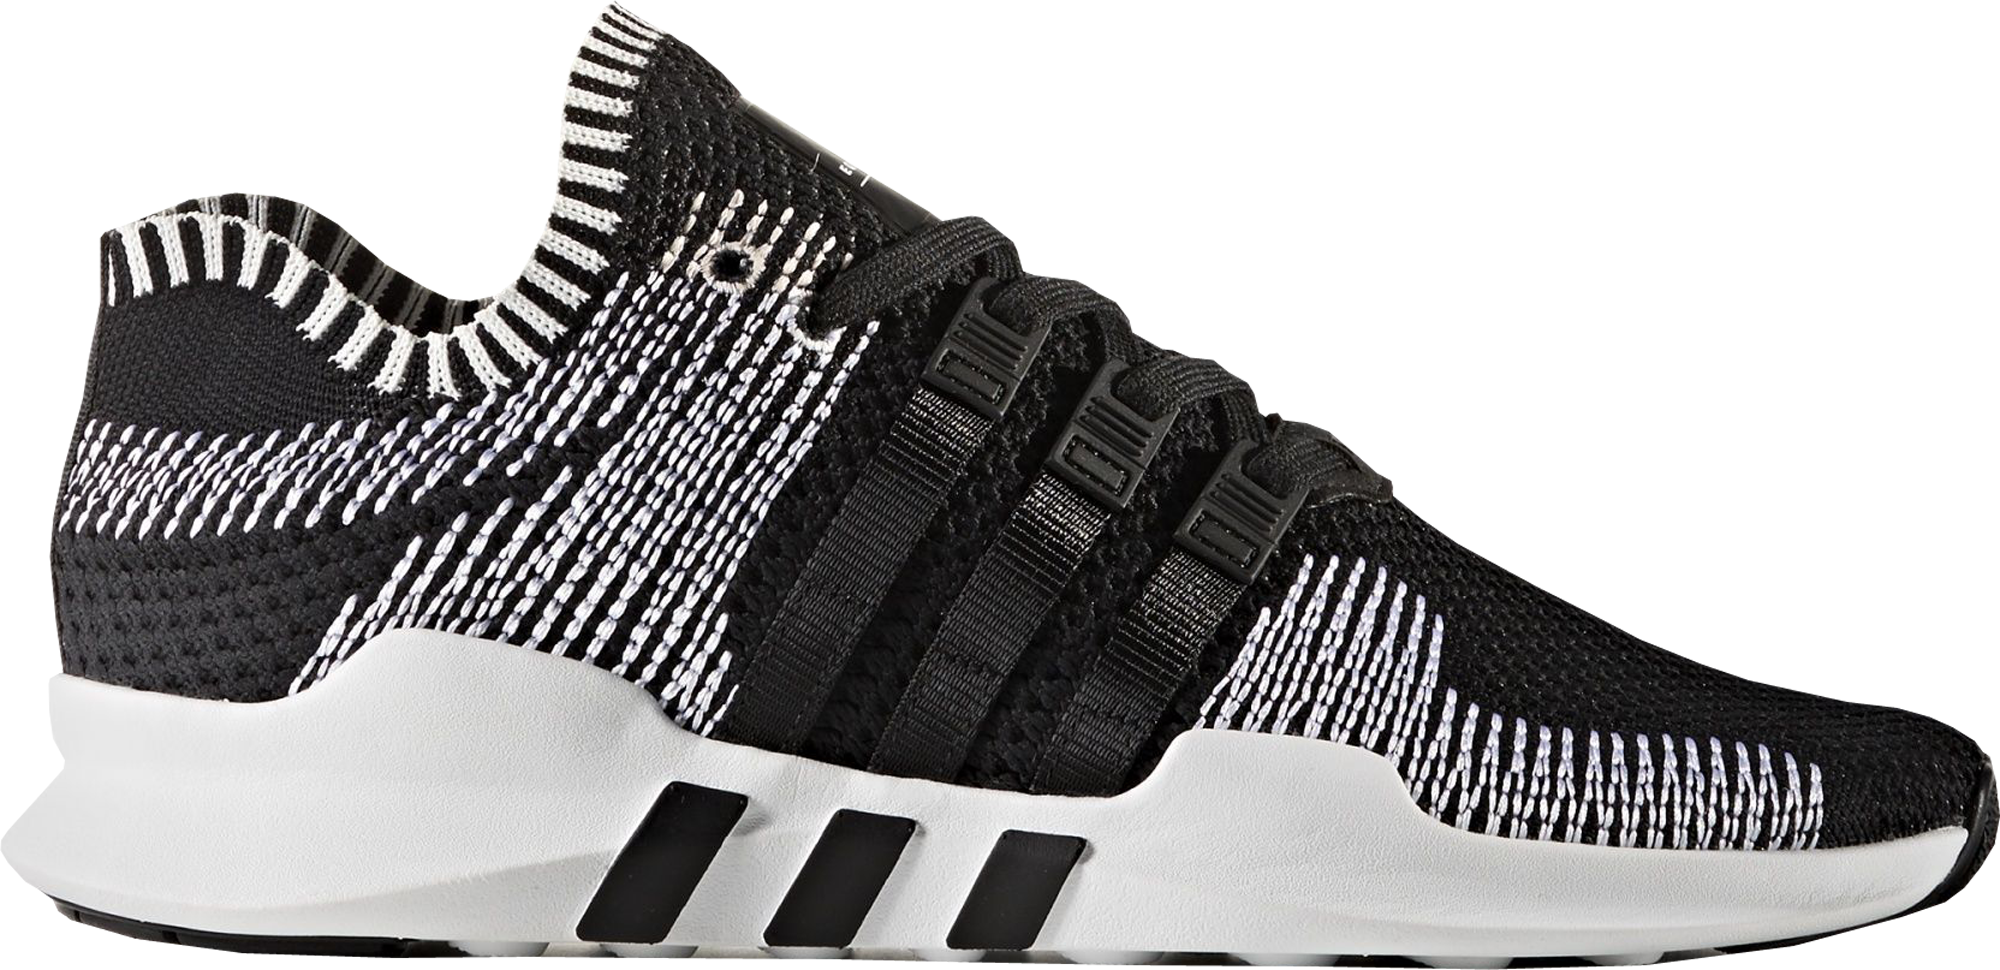 adidas EQT Support Adv Primeknit Black